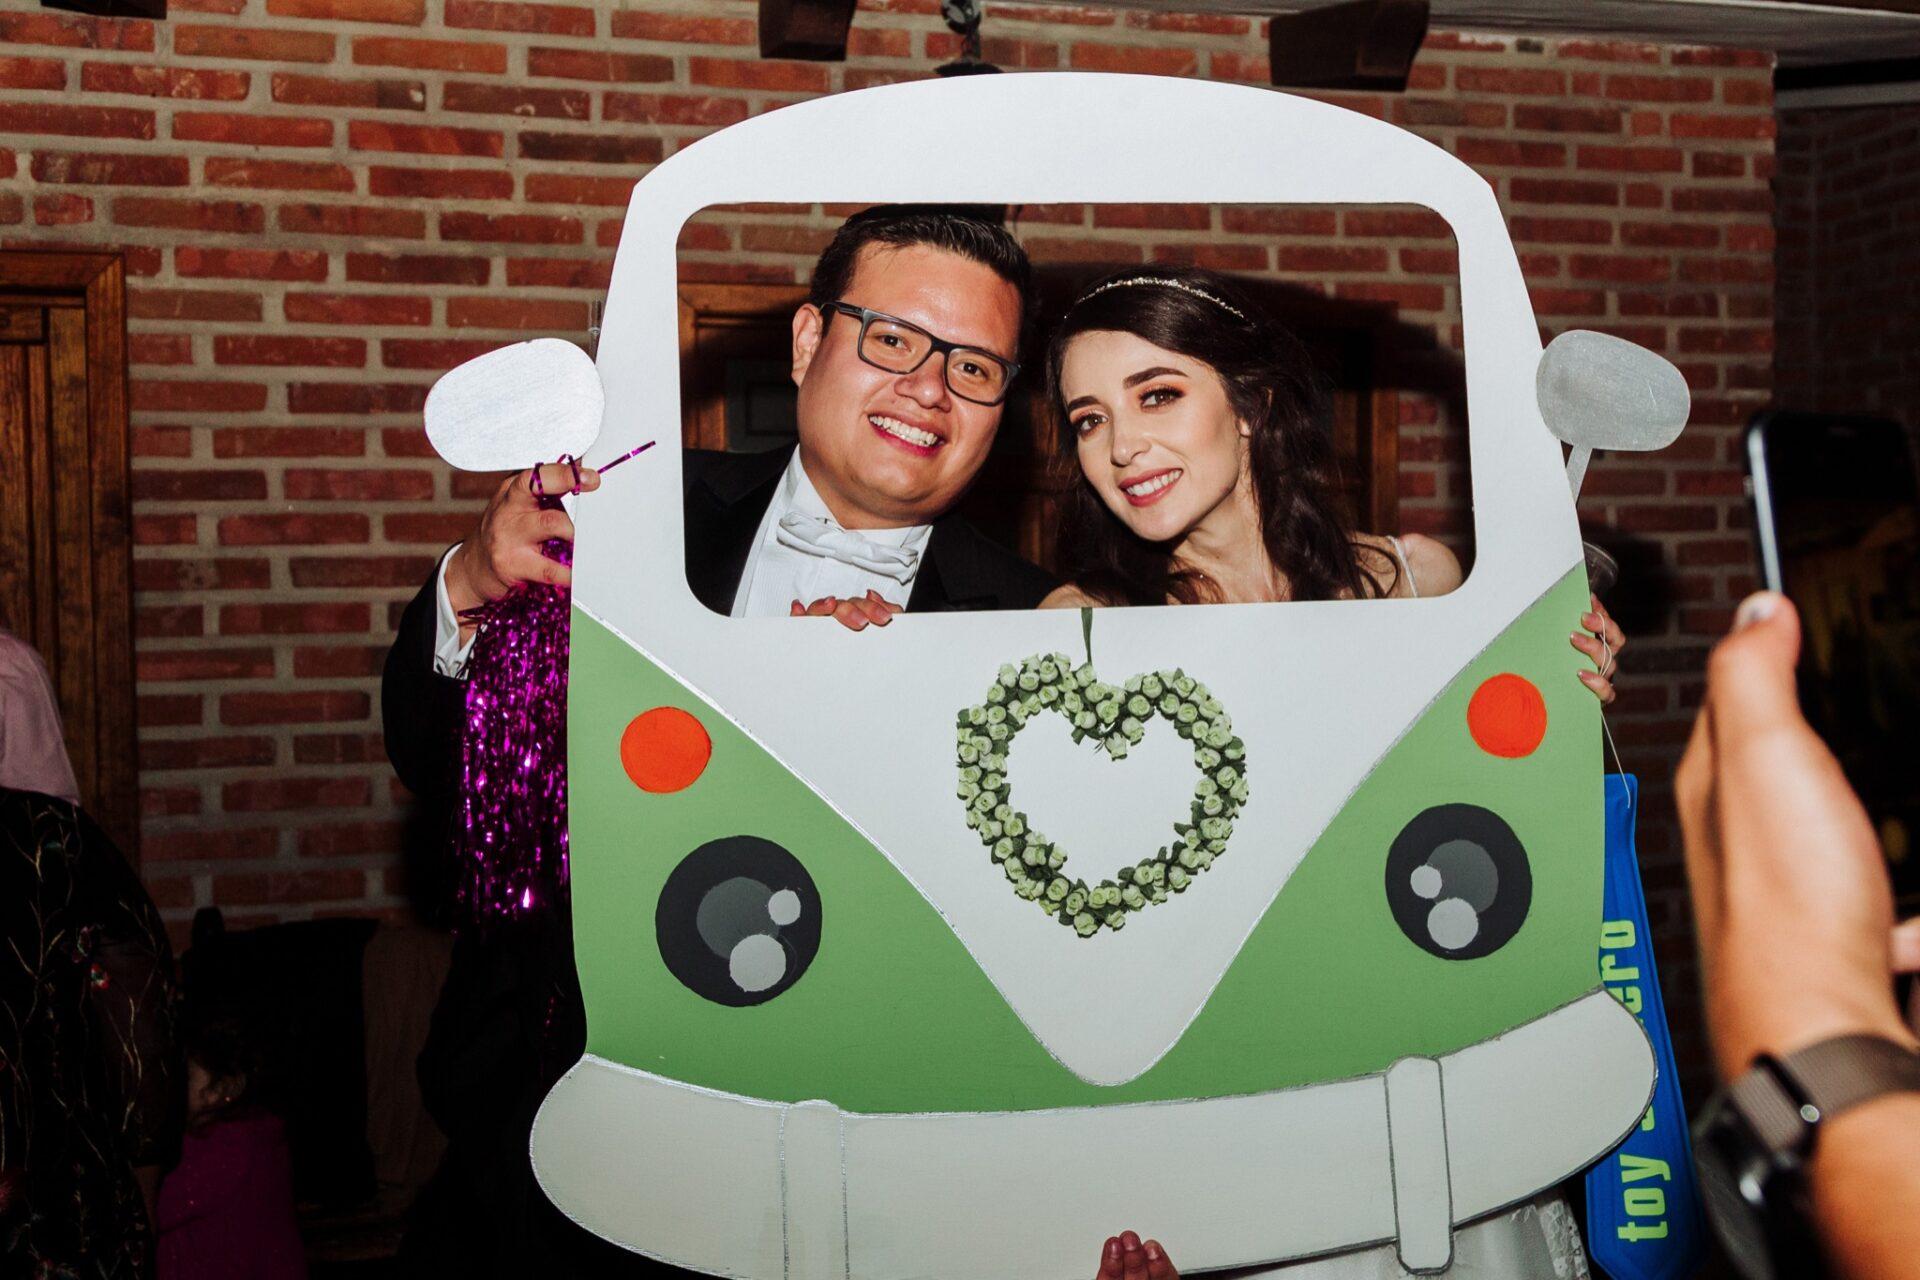 javier_noriega_fotografo_bodas_teul_zacatecas_wedding_photographer44